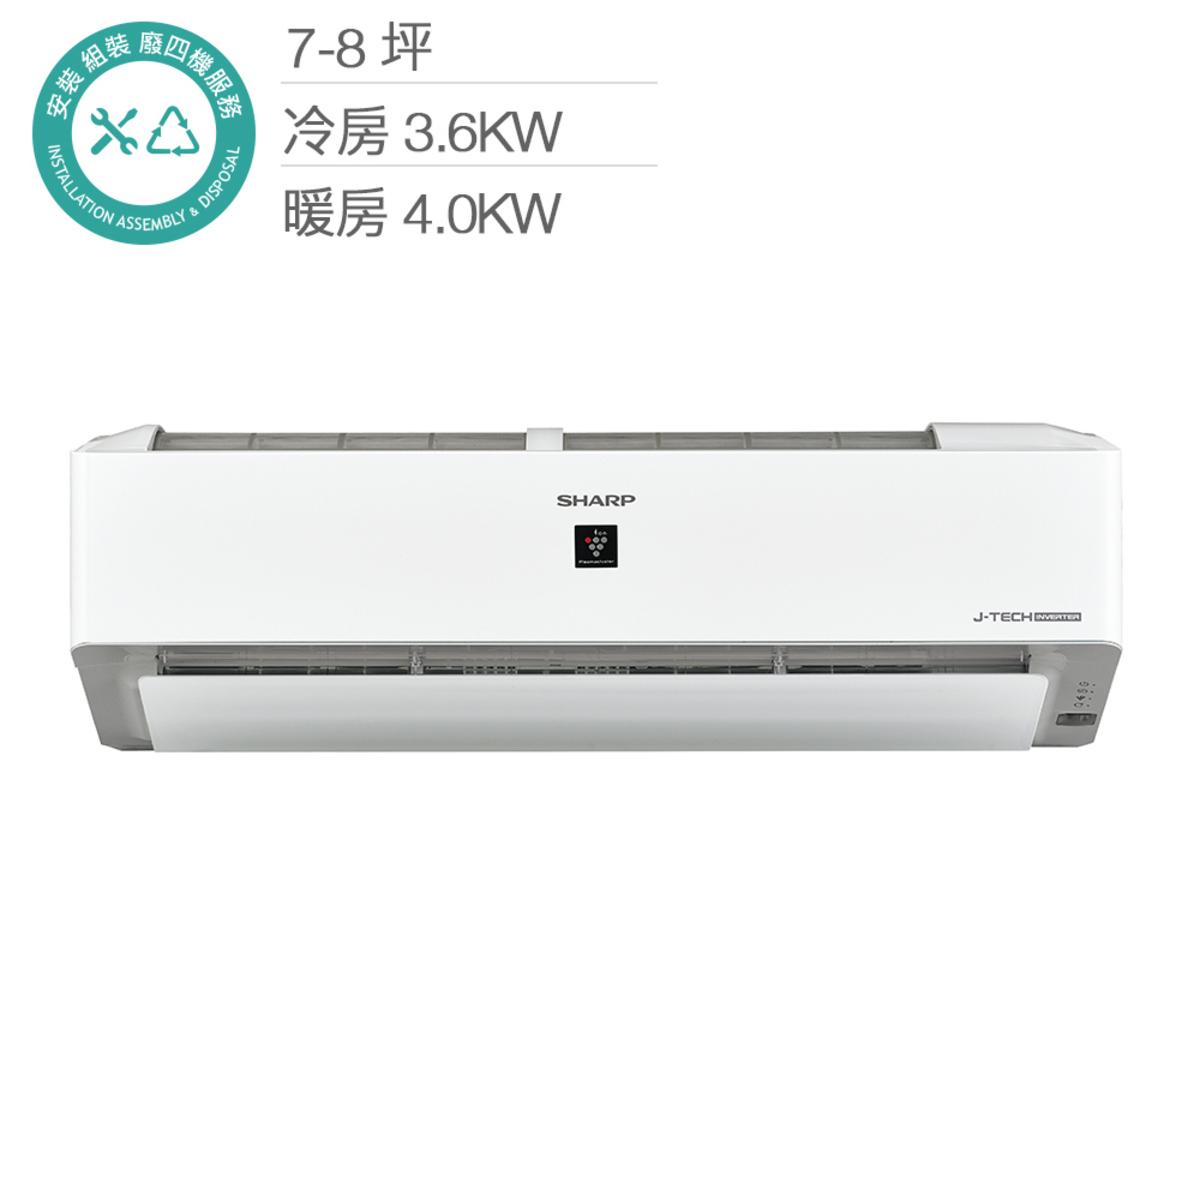 SHARP一對一自動除菌離子旗艦冷暖型變頻空調